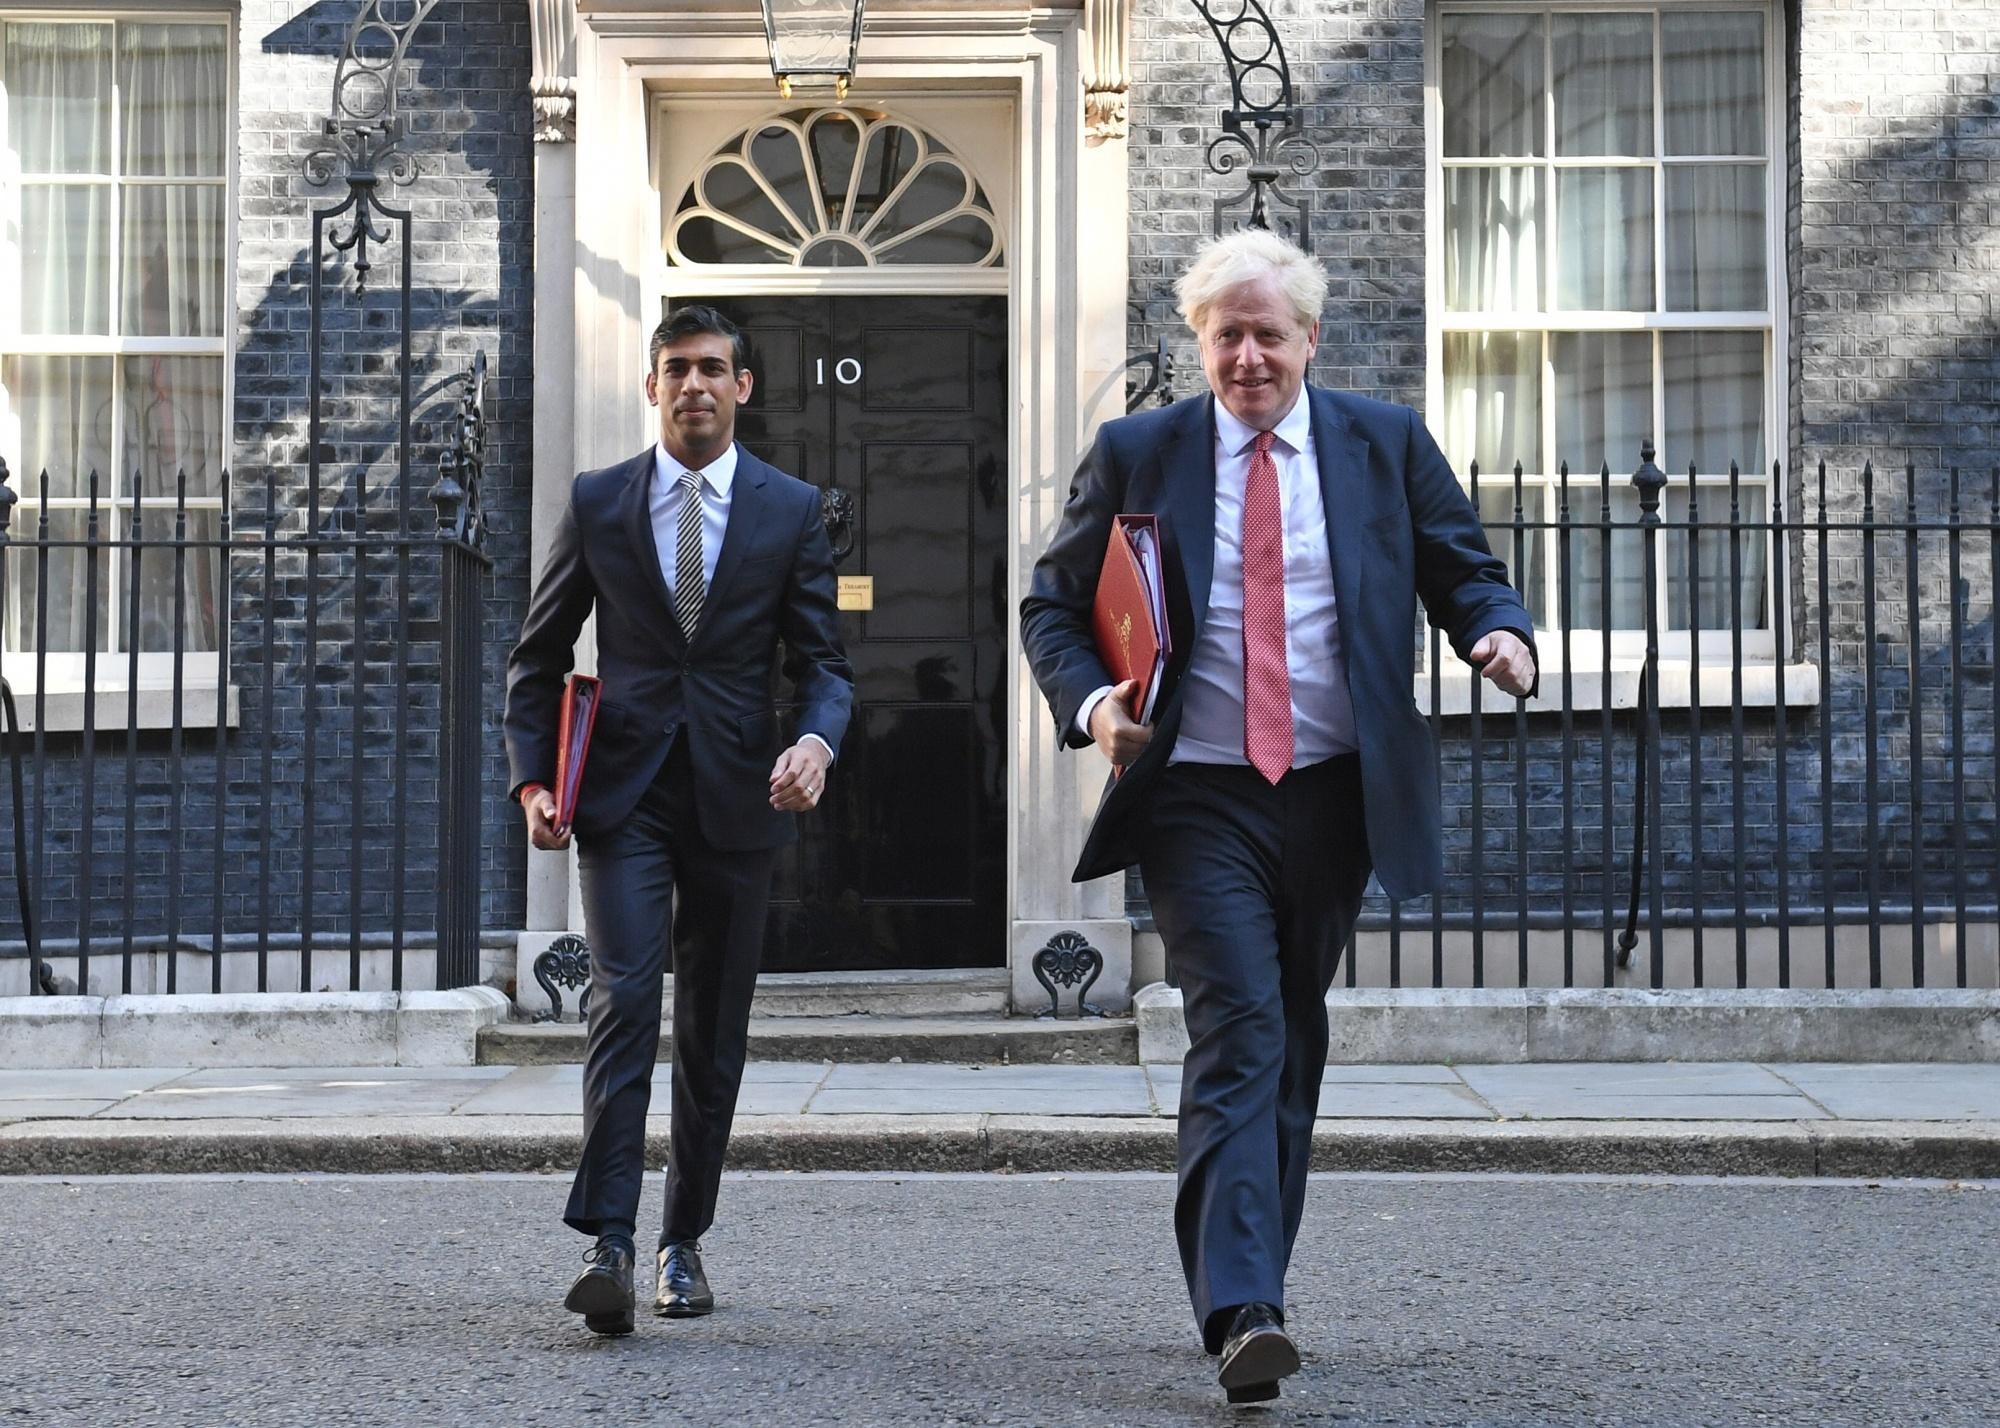 Chancellor Rishi Sunak Backtracks on Raising U.K. Taxes - Bloomberg